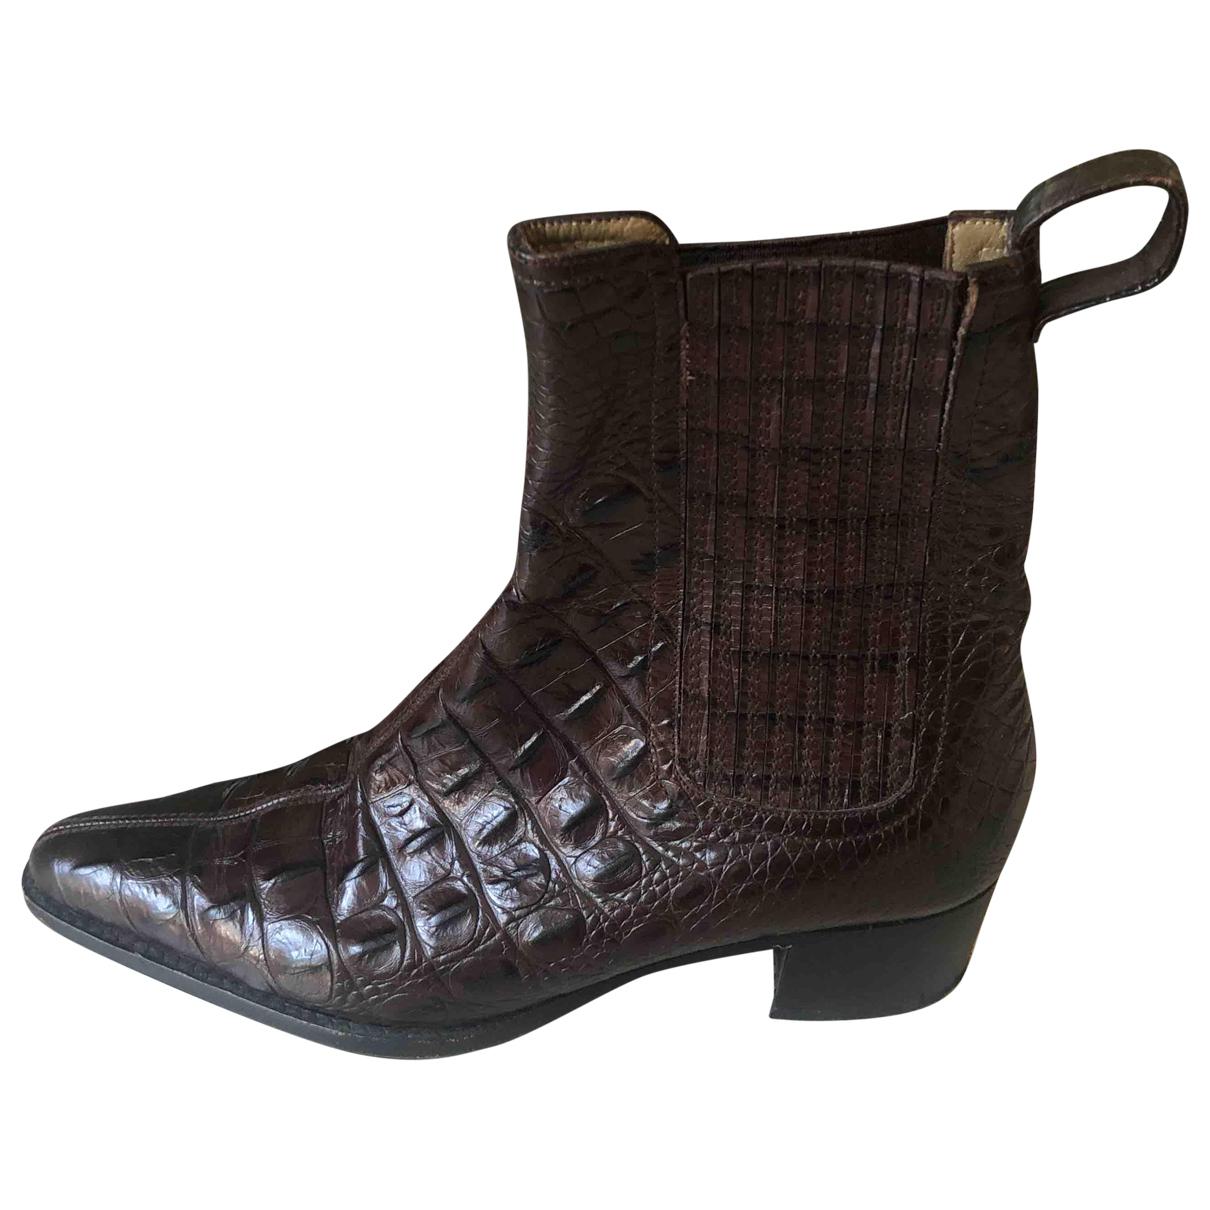 Charles Jourdan N Brown Crocodile Ankle boots for Women 36 EU